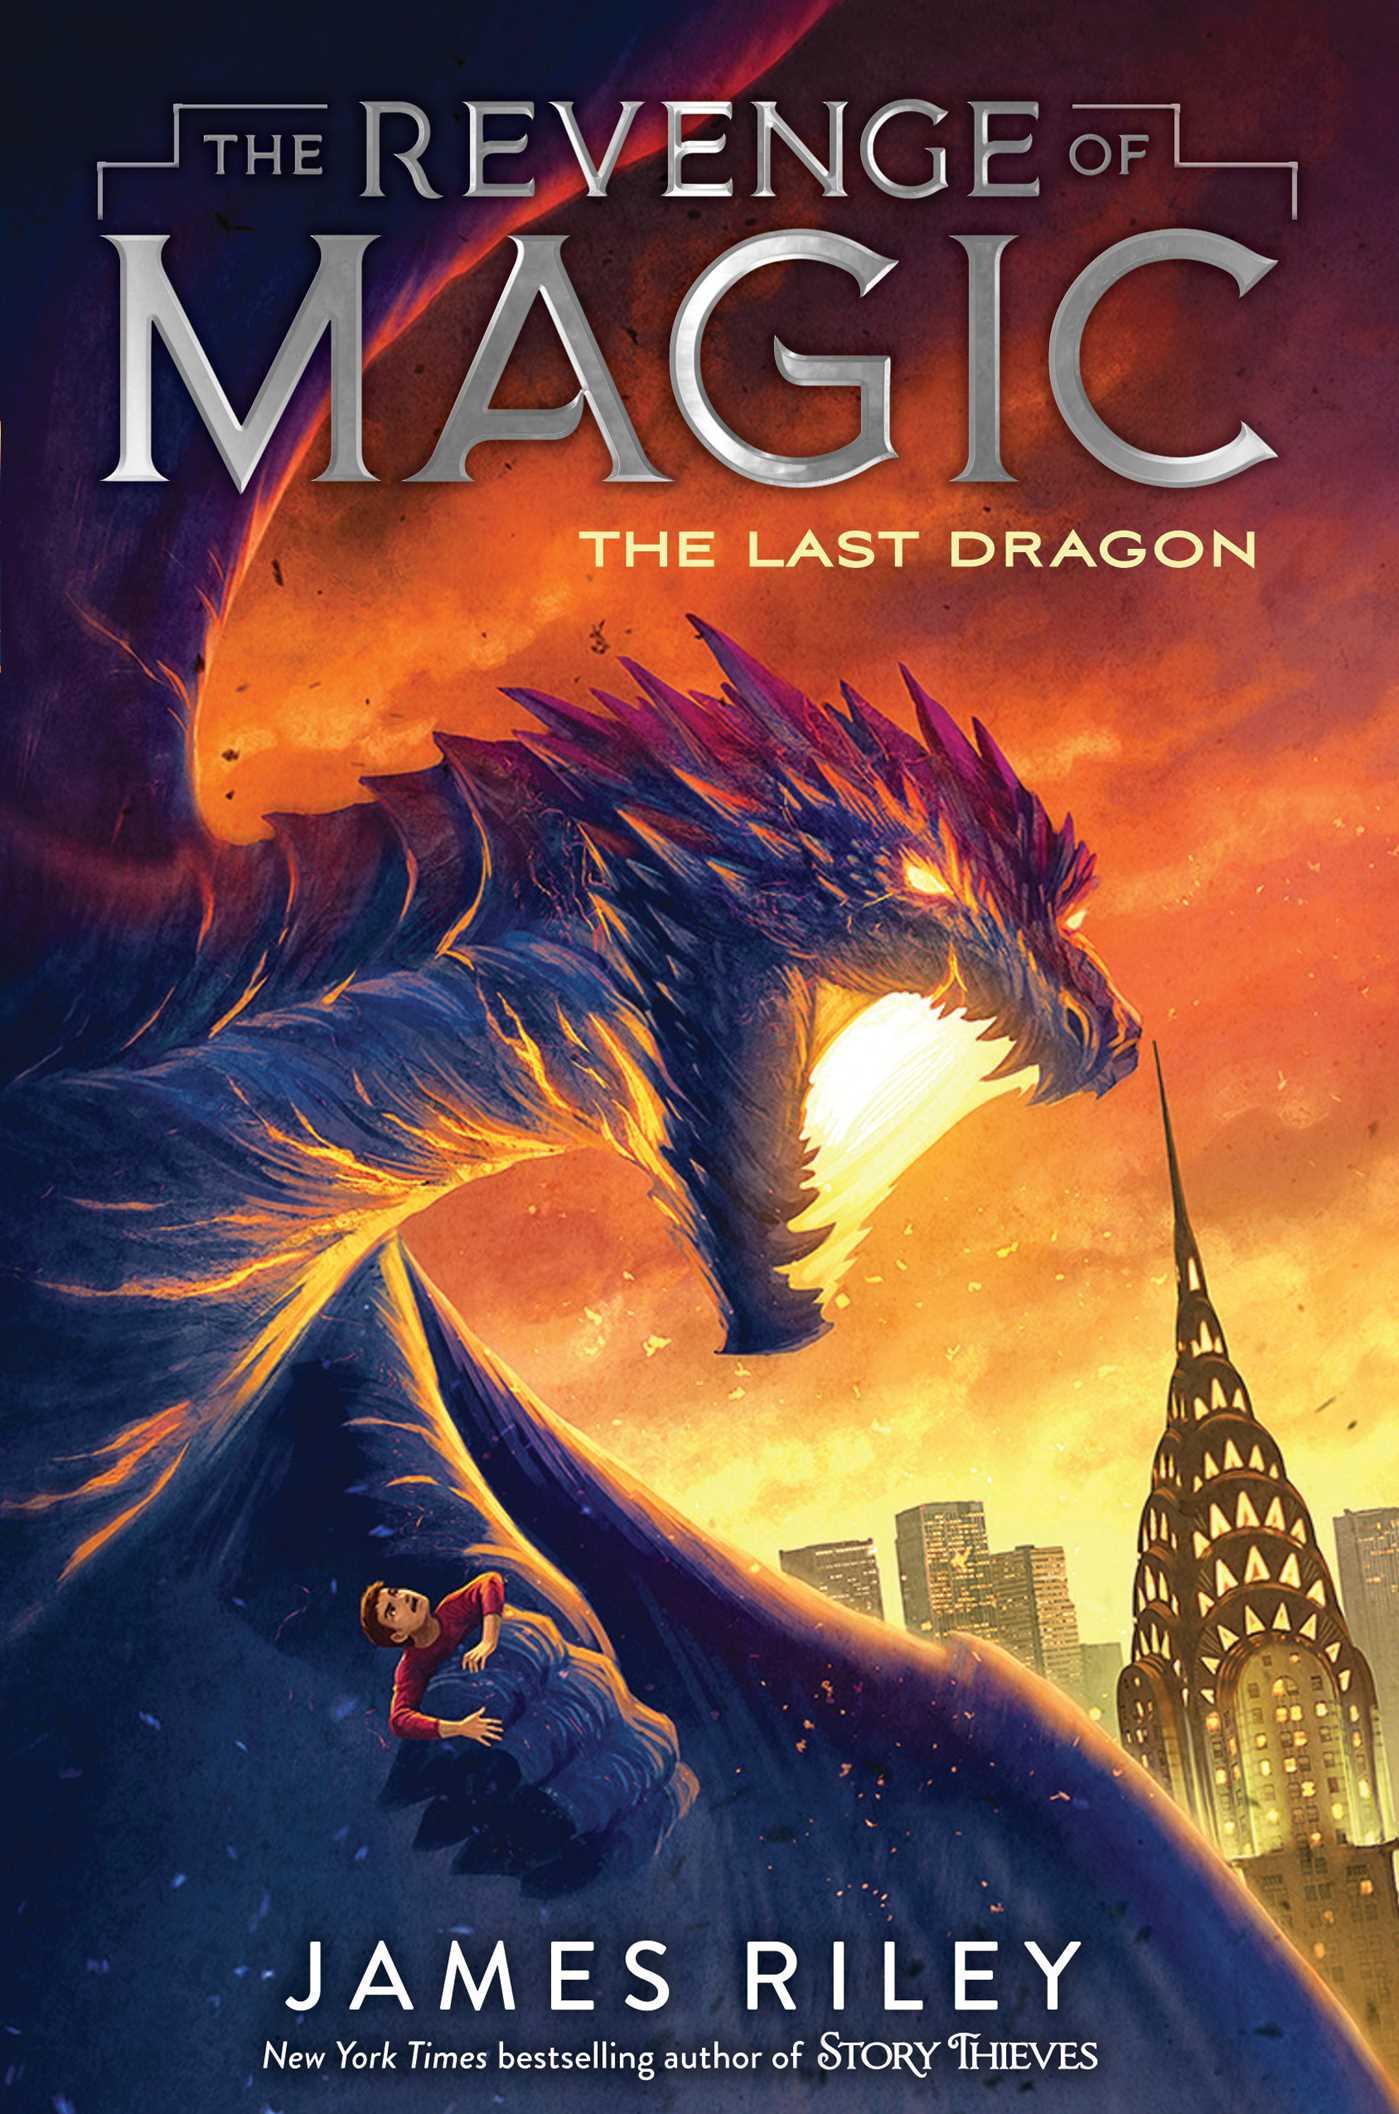 The Last Dragon (The Revenge of Magic #2)